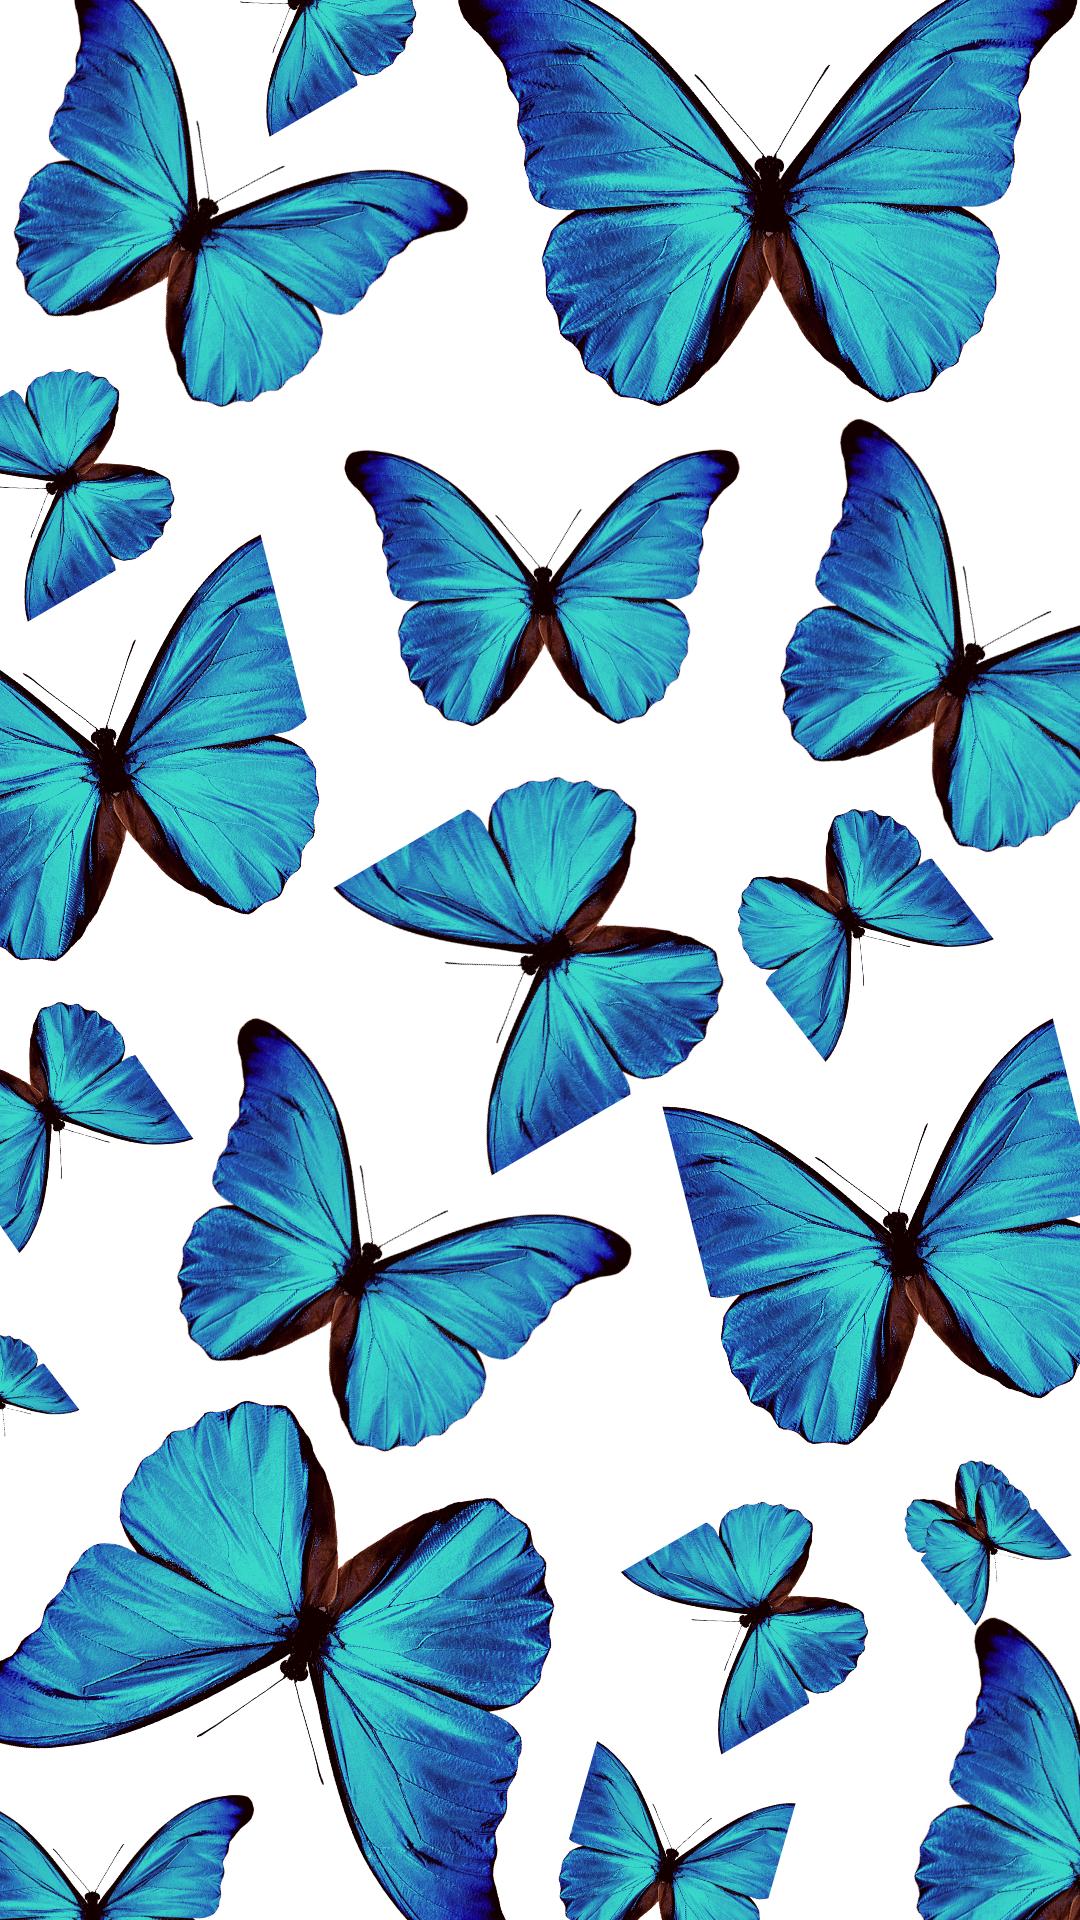 Blue Aesthetic Wallpaper Butterfly Wallpaper Backgrounds Blue Butterfly Wallpaper Butterfly Wallpaper Iphone